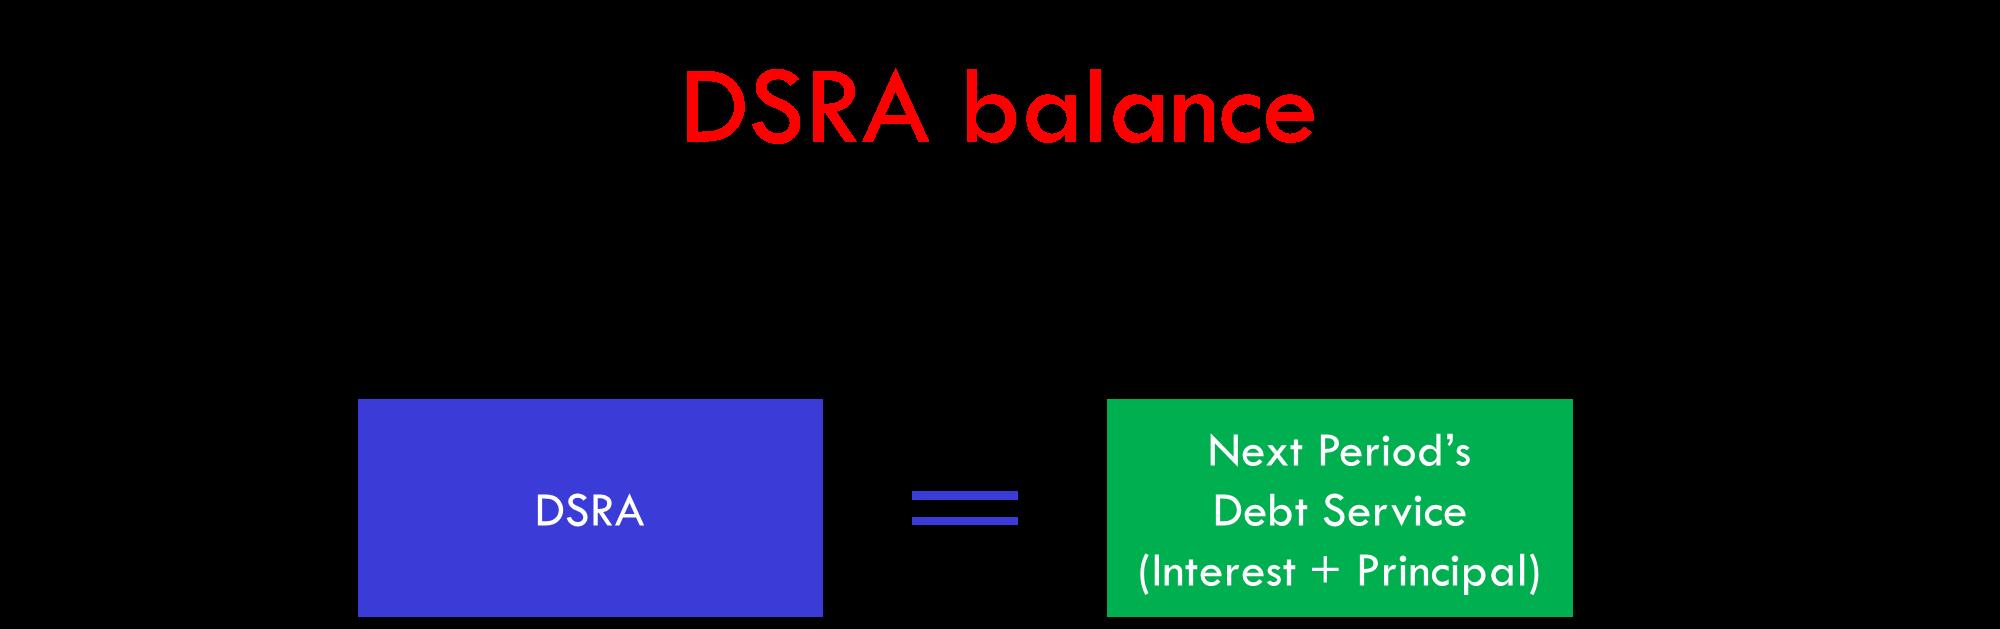 DSRA target balance